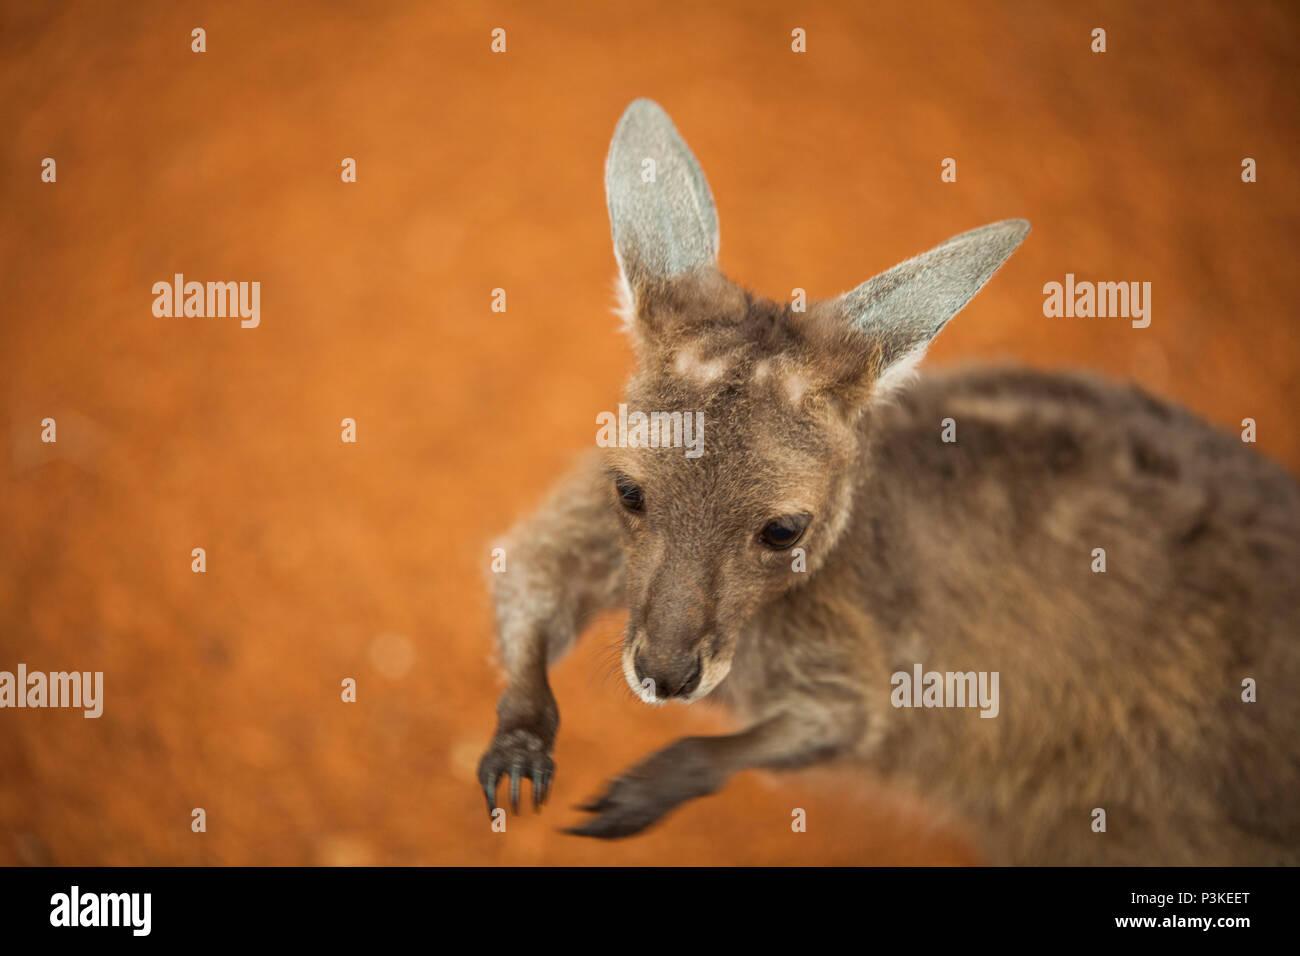 Baby kangaroo (joey), Perth Zoo, Western Australia - Stock Image